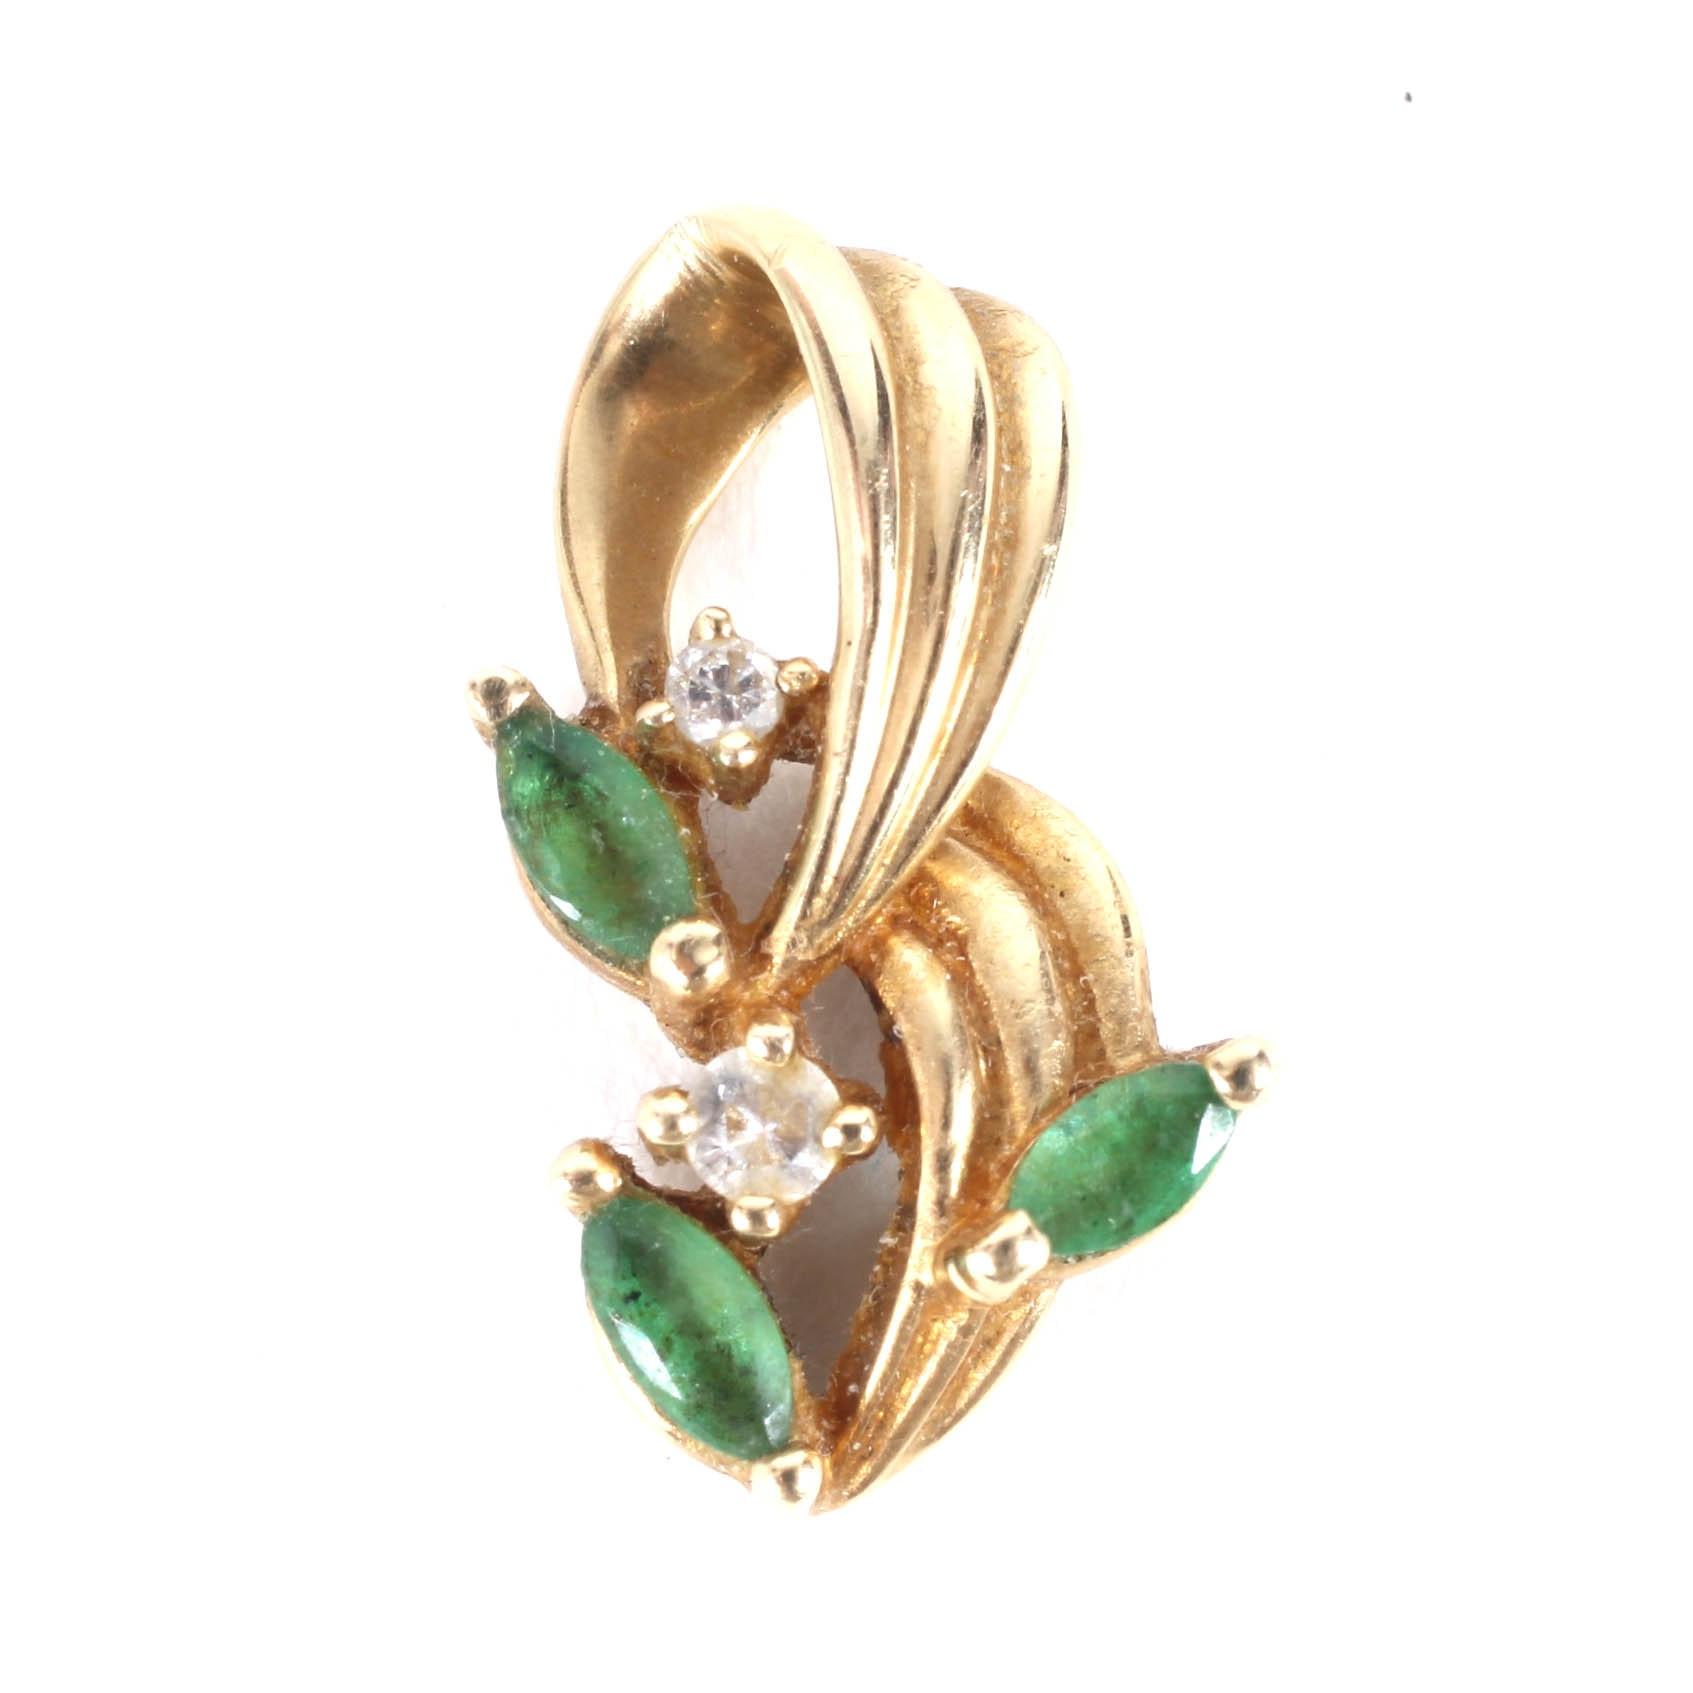 14K Gold, Emerald and Diamond Pendant